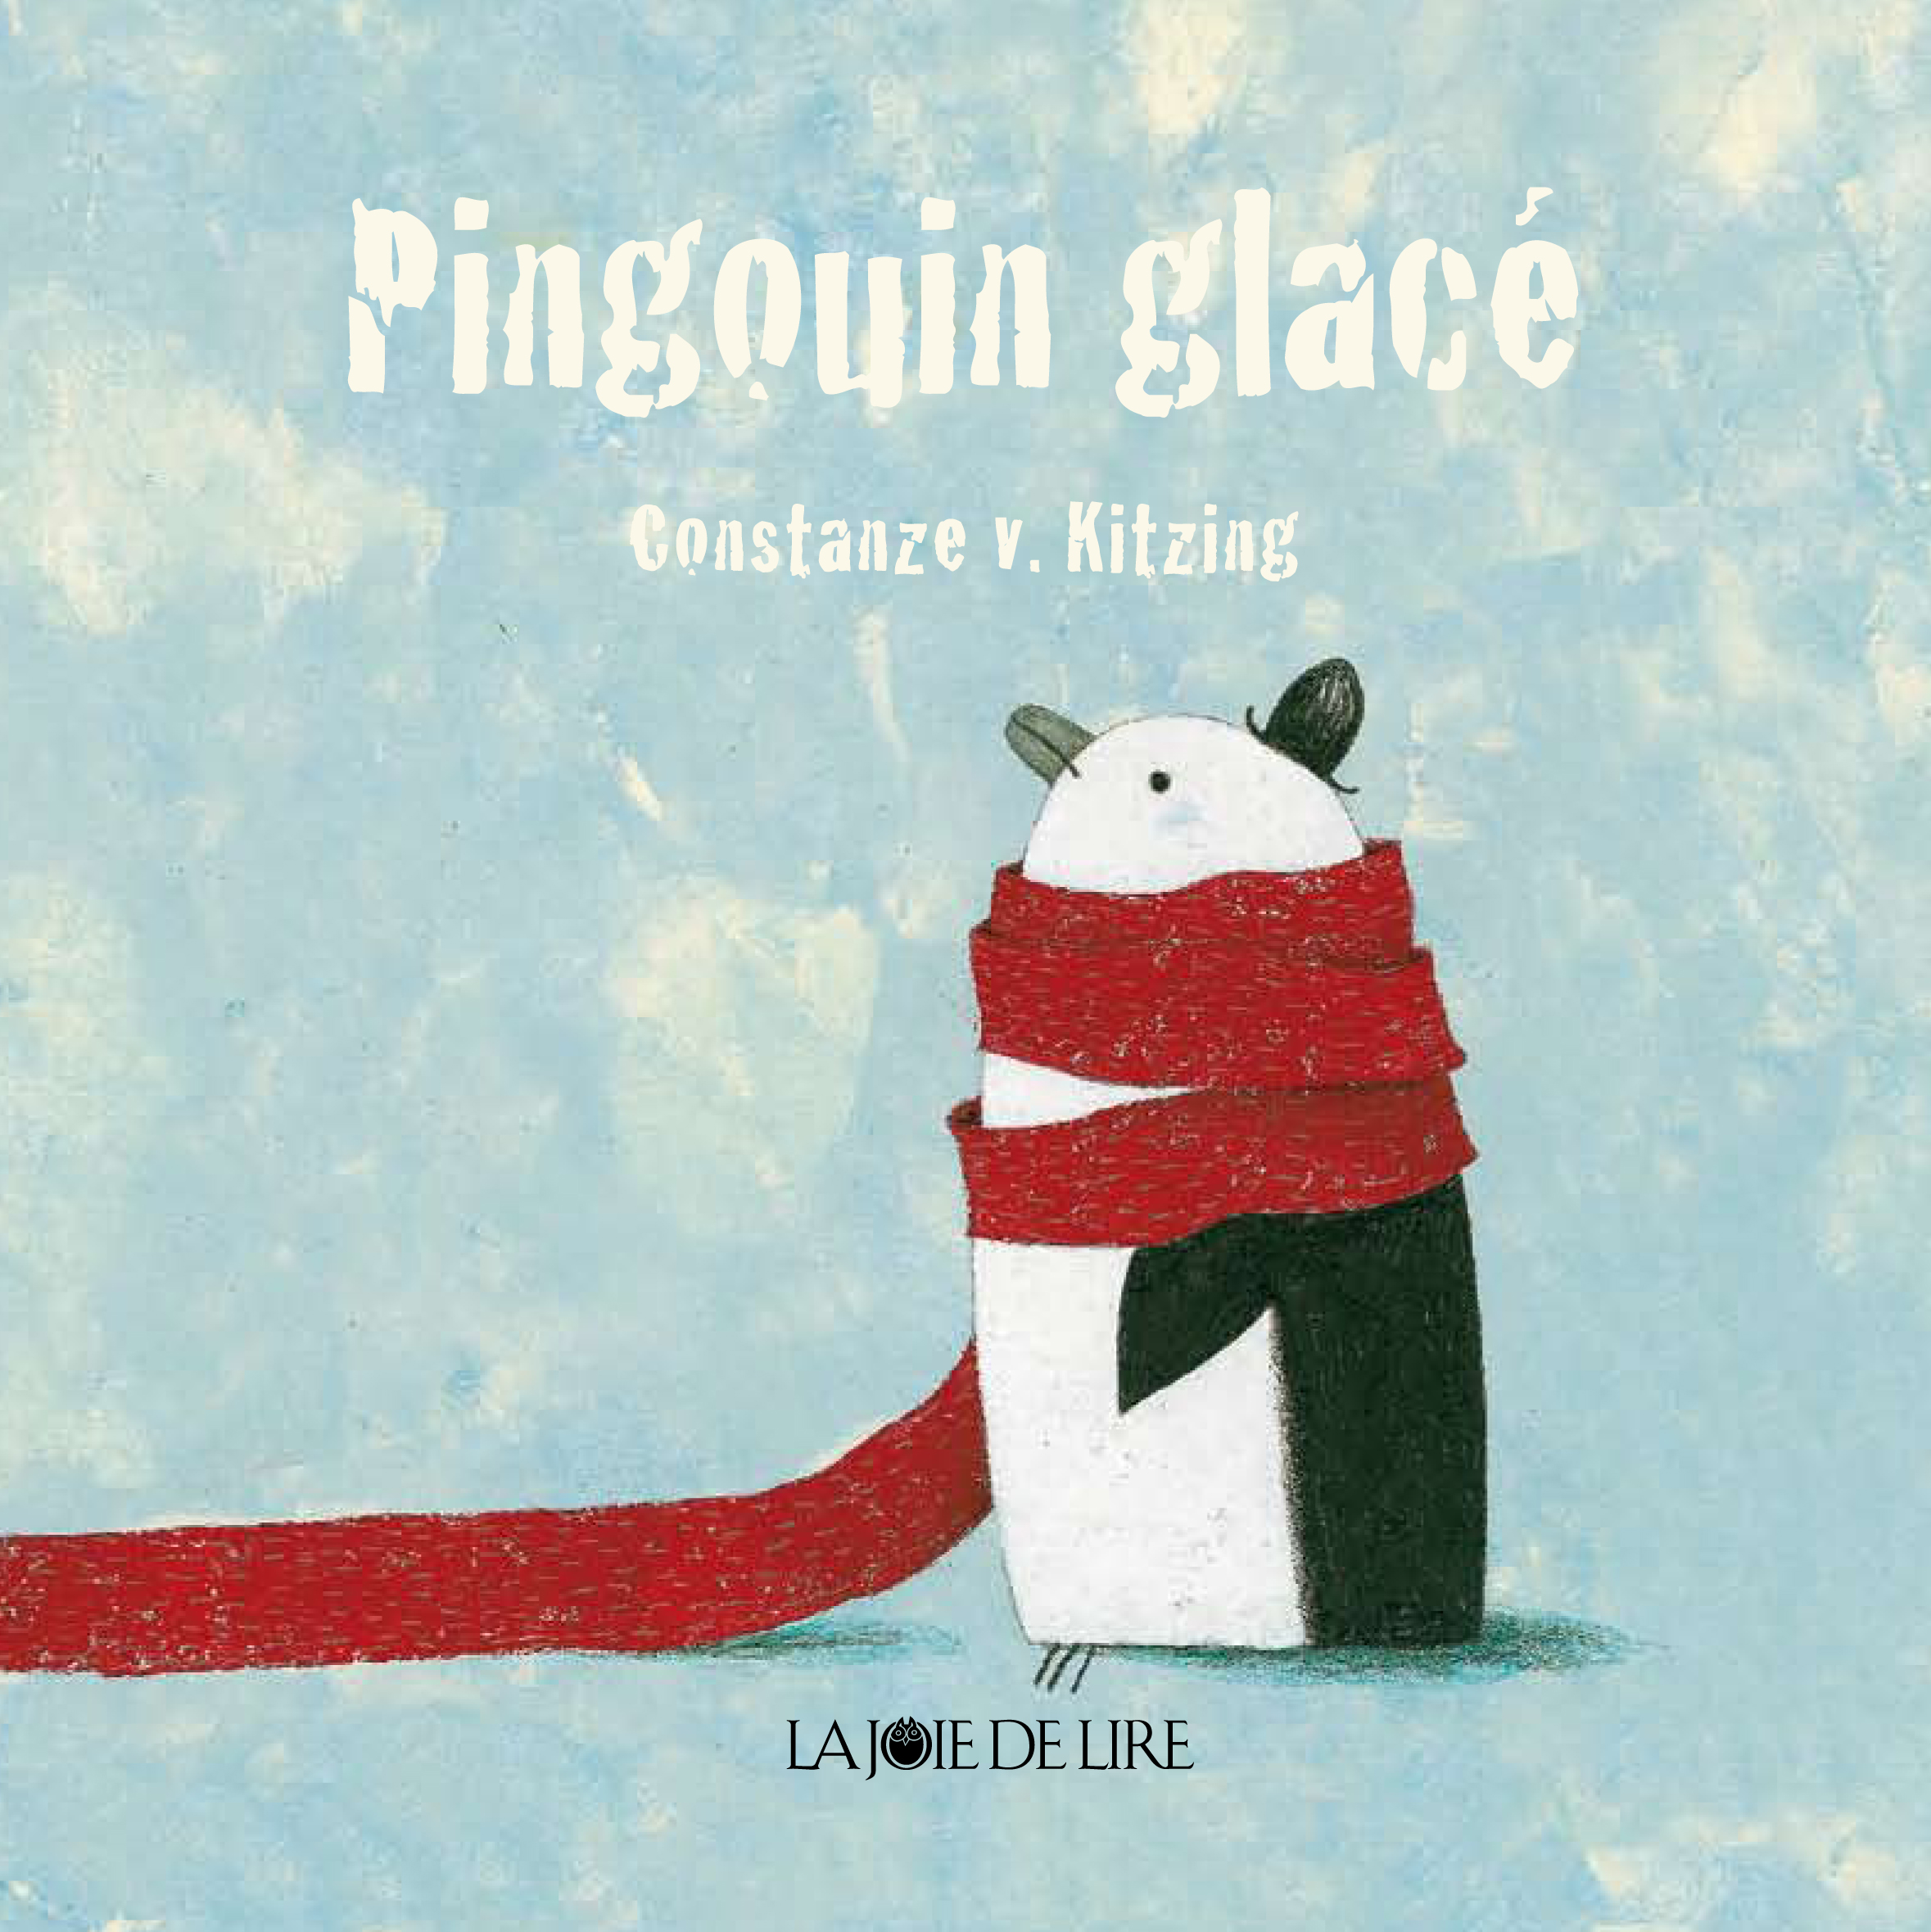 Pingouin-Cover Kopie.jpg